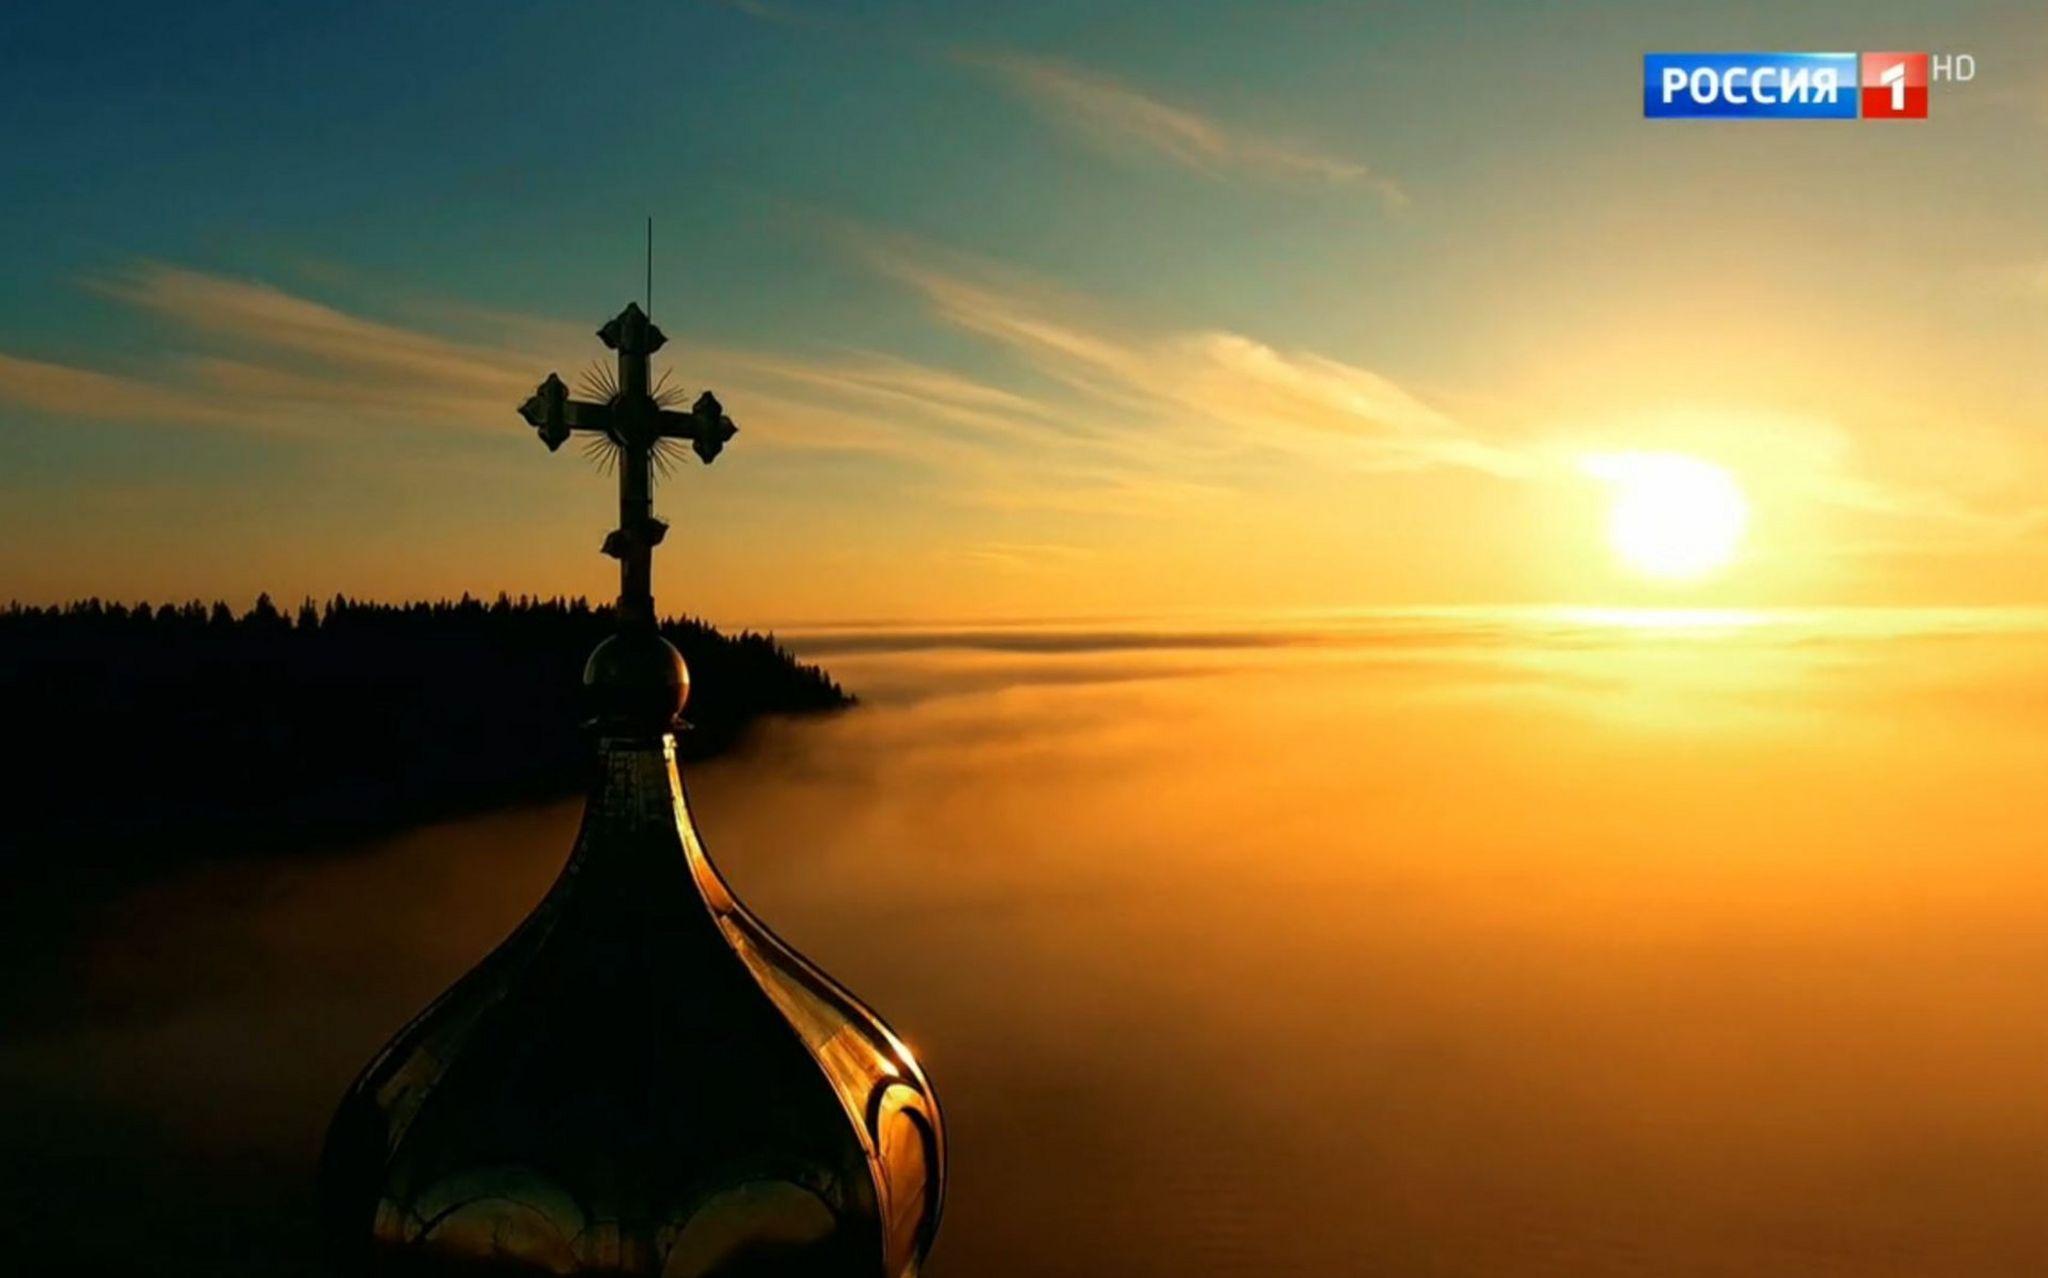 Screengrab from the Rossiya 1 documentary Valaam